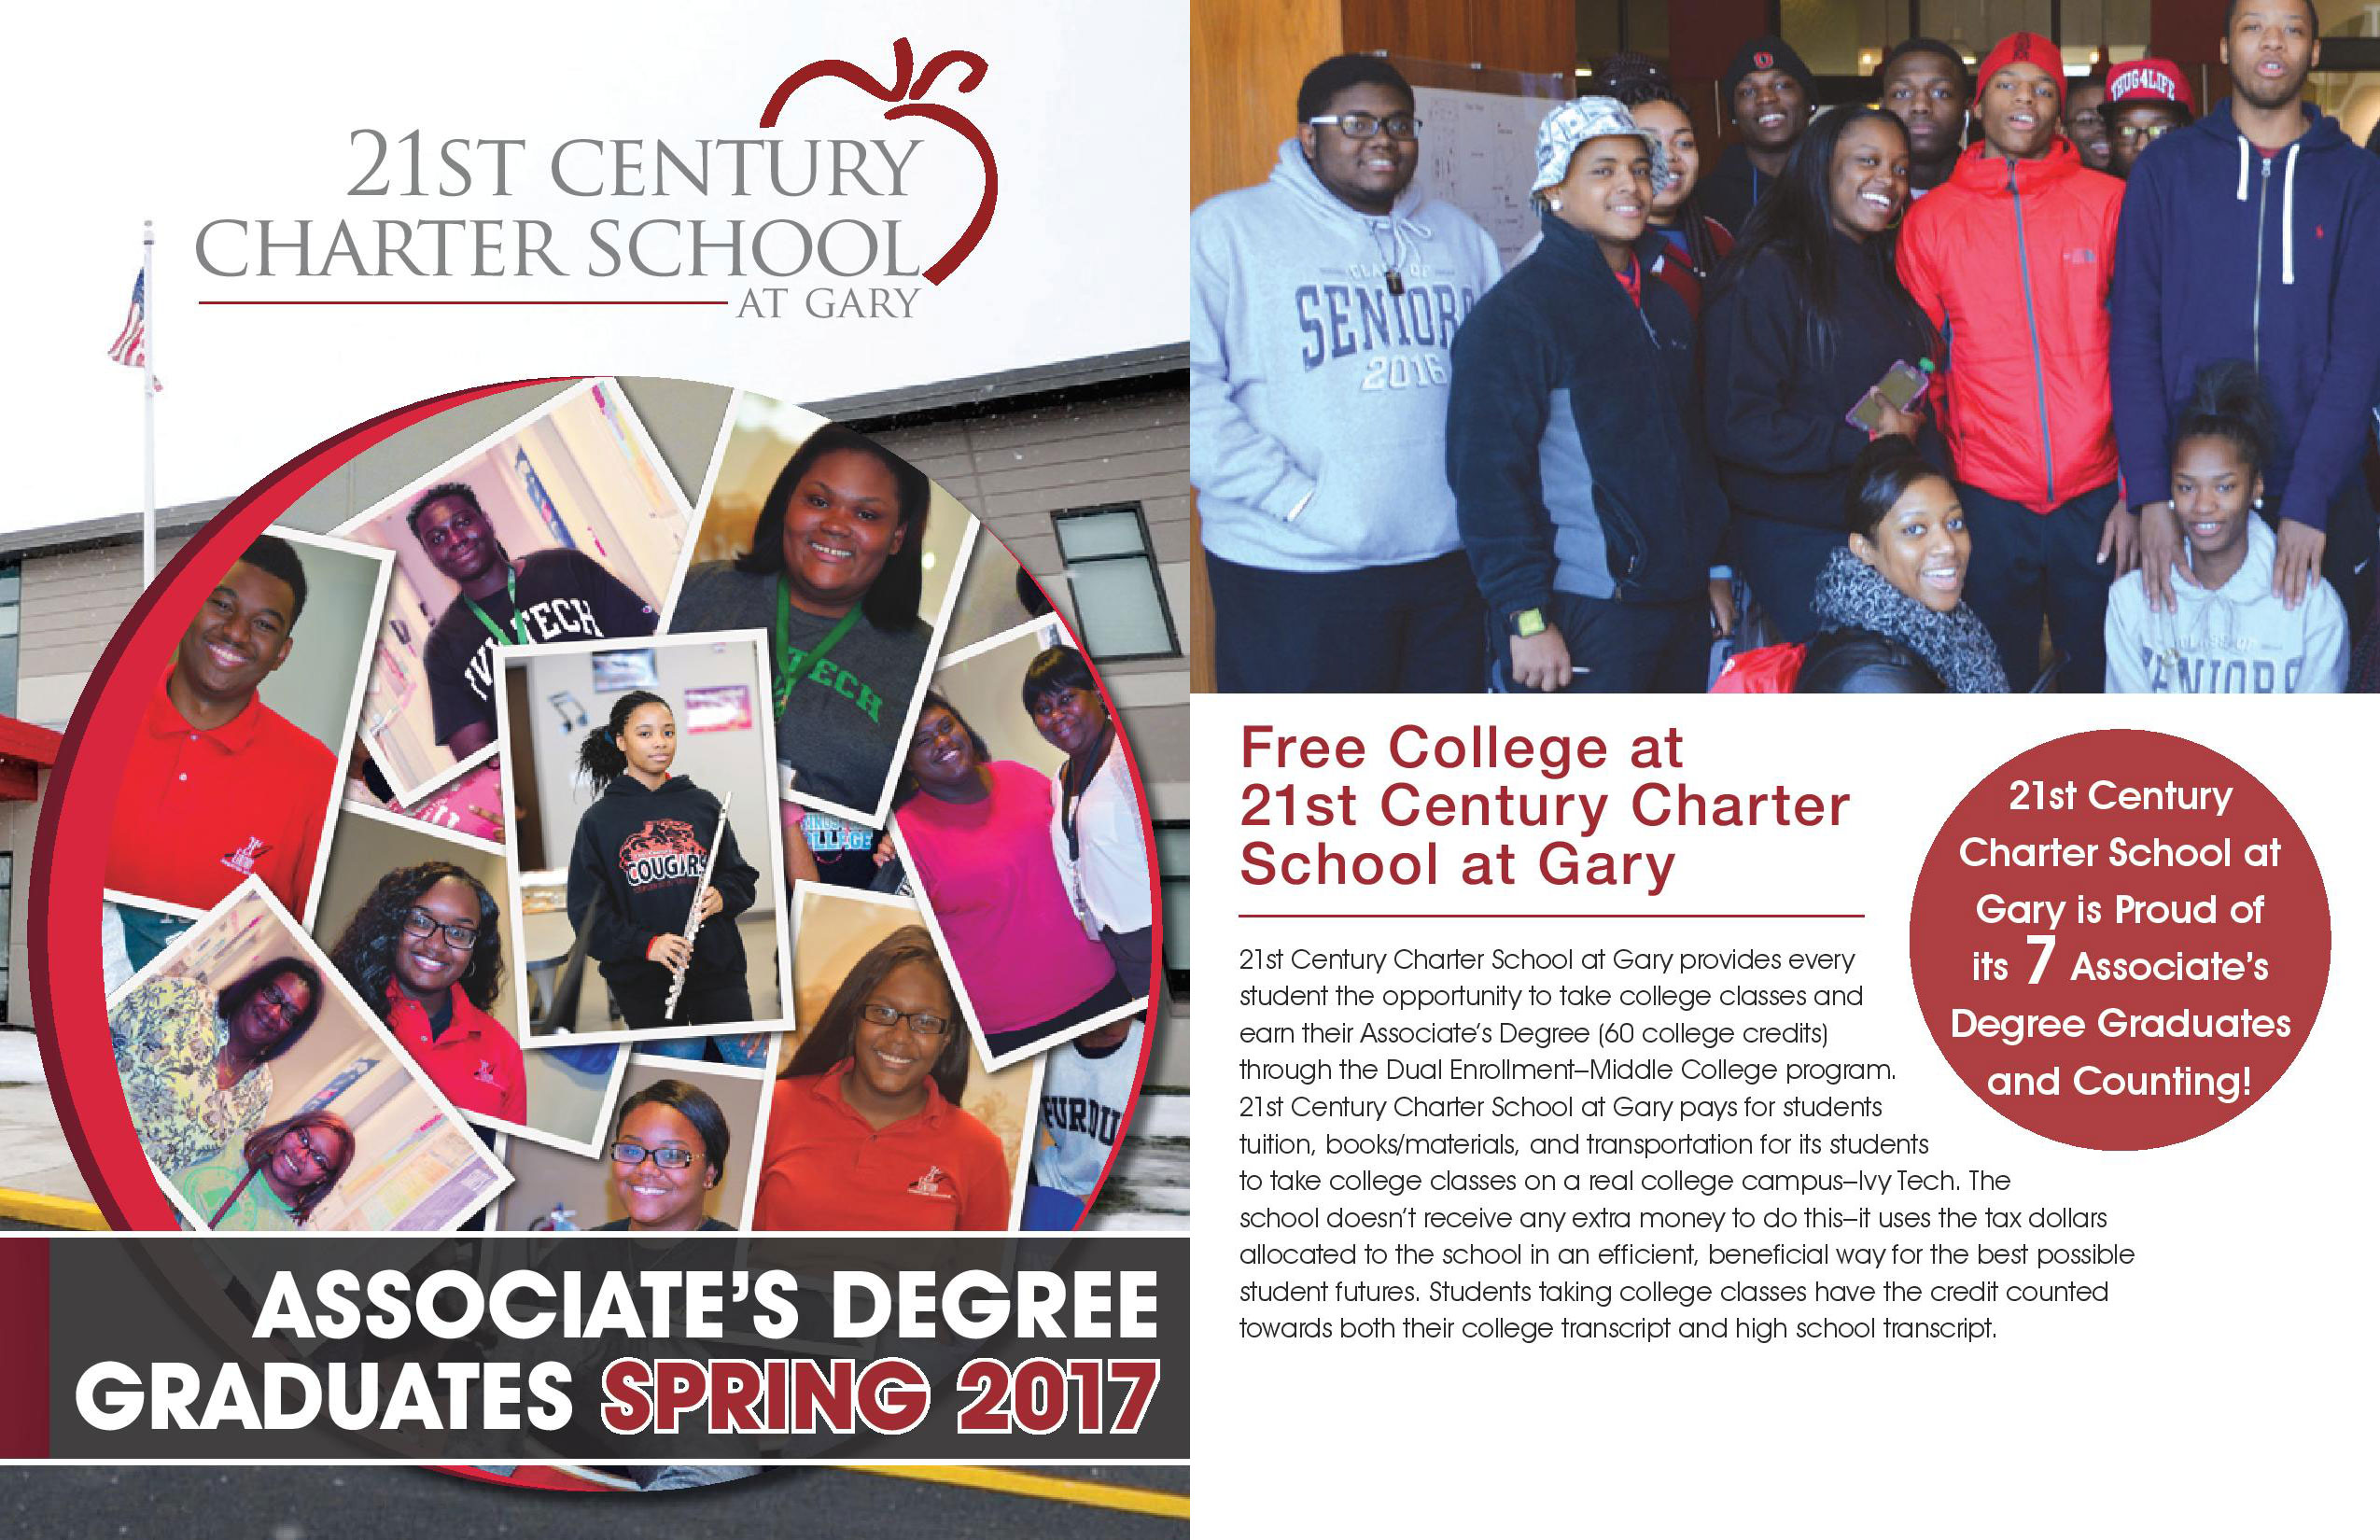 21st Century Charter School - Associate's Degree Graduates Spring 2017